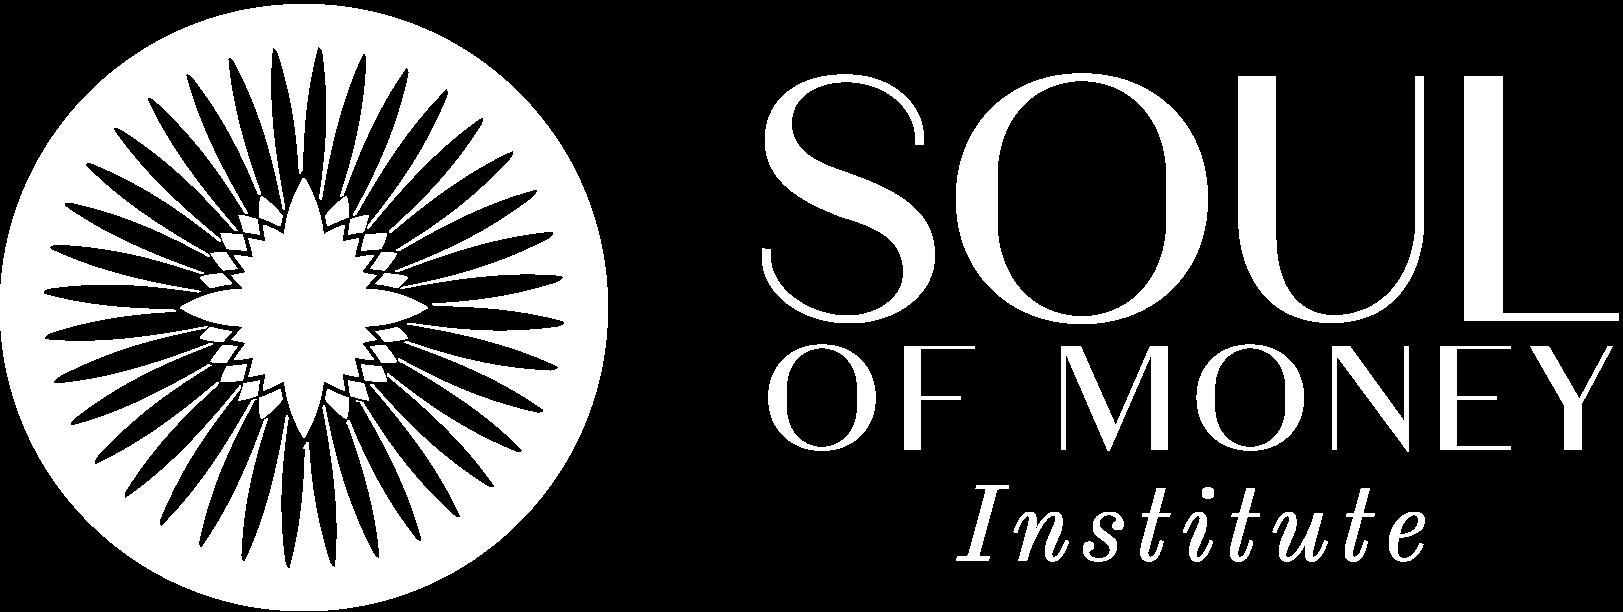 Soul of Money logo